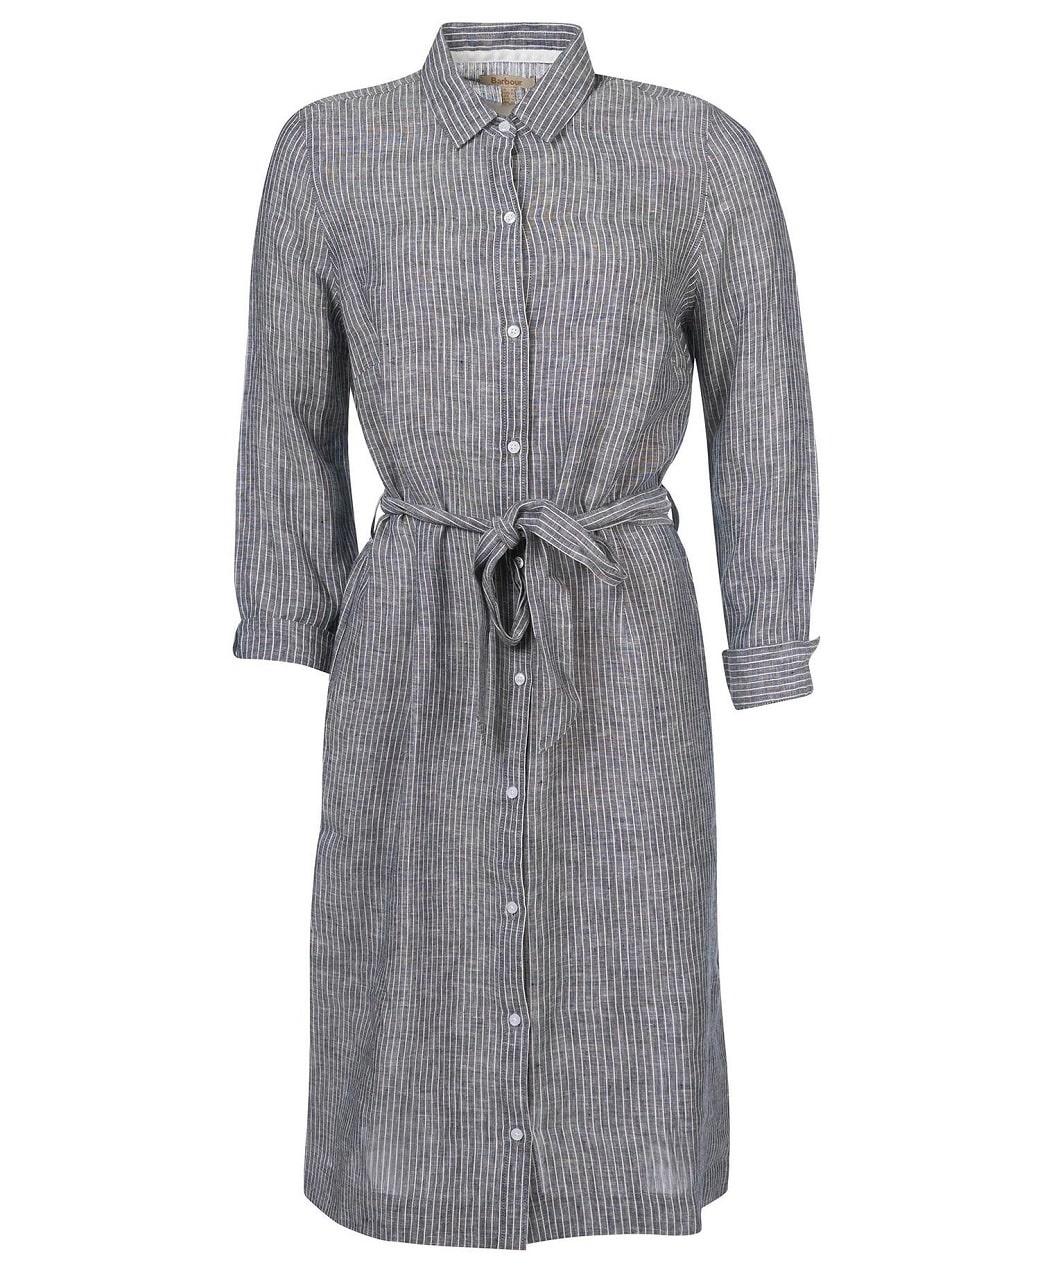 Barbour Tern Dress Navy-1